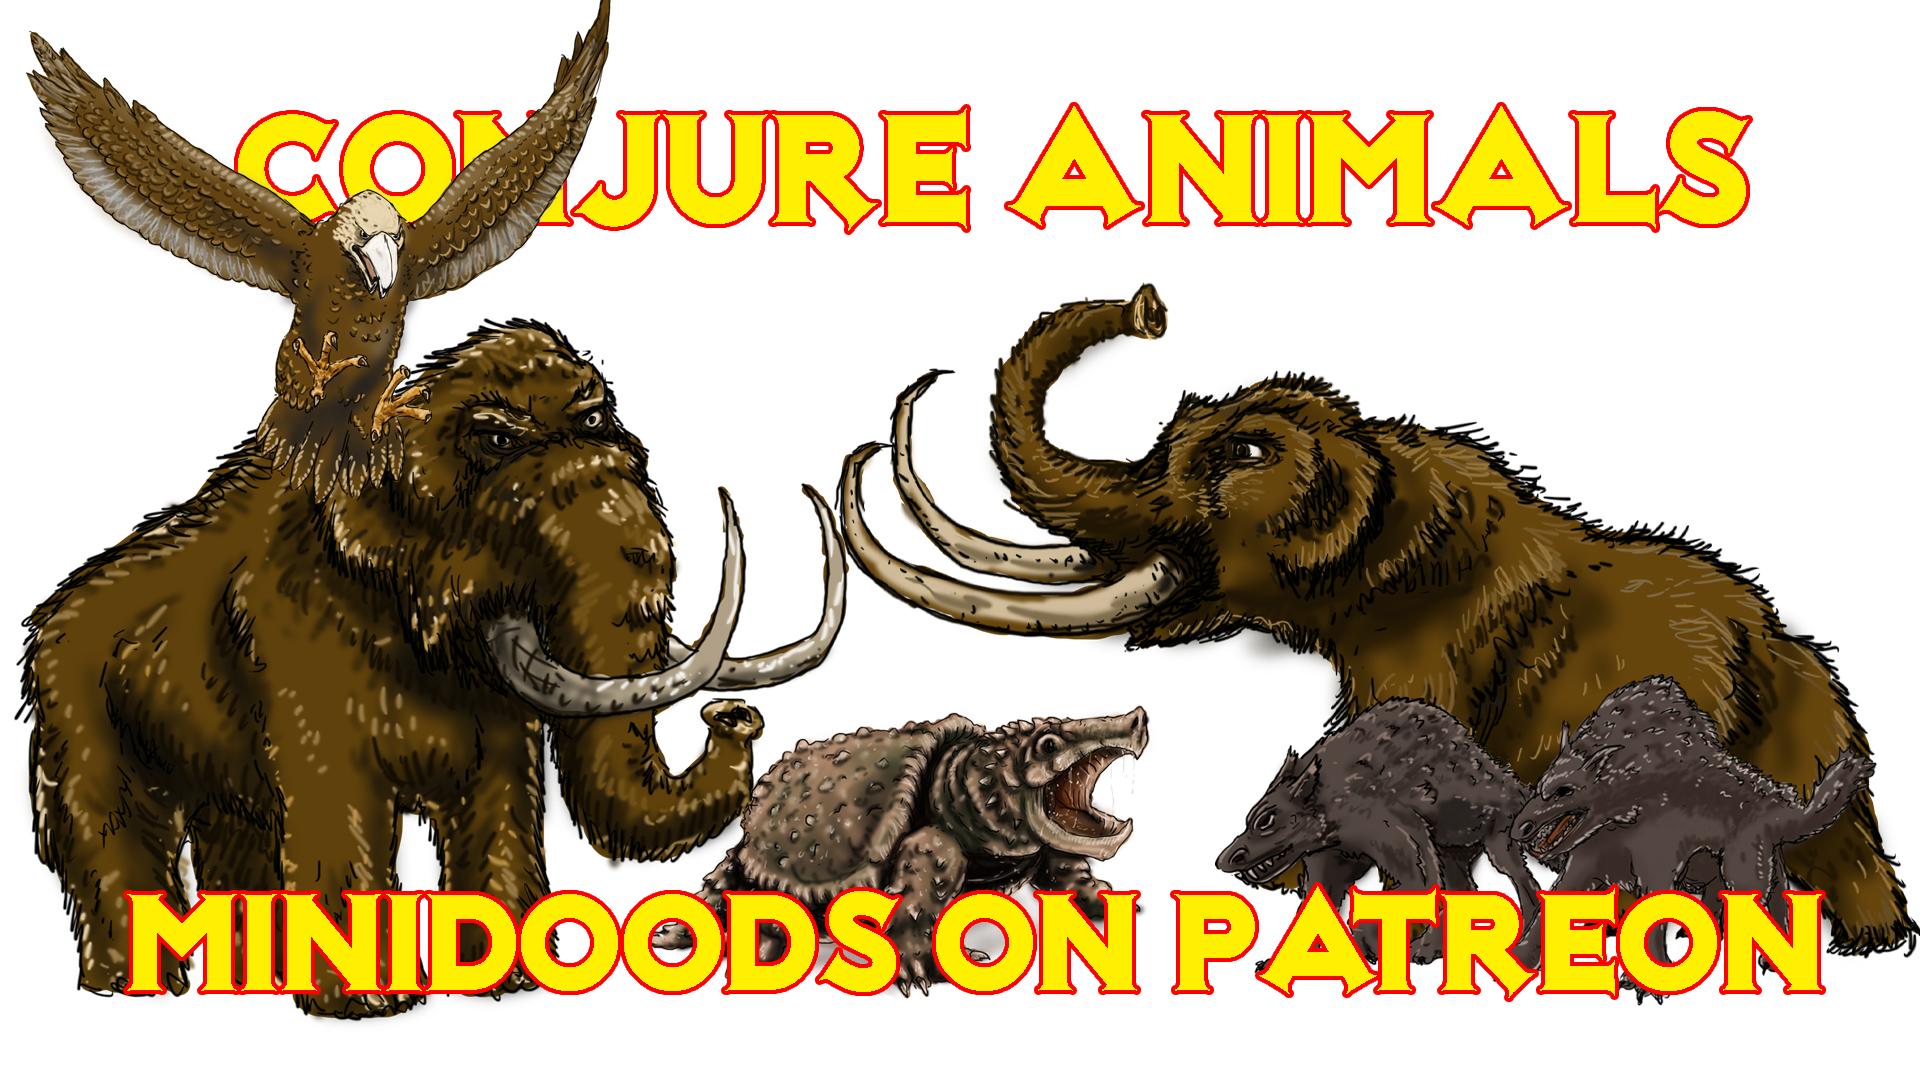 PROMO GROUP SHOT conjure animals part 2.